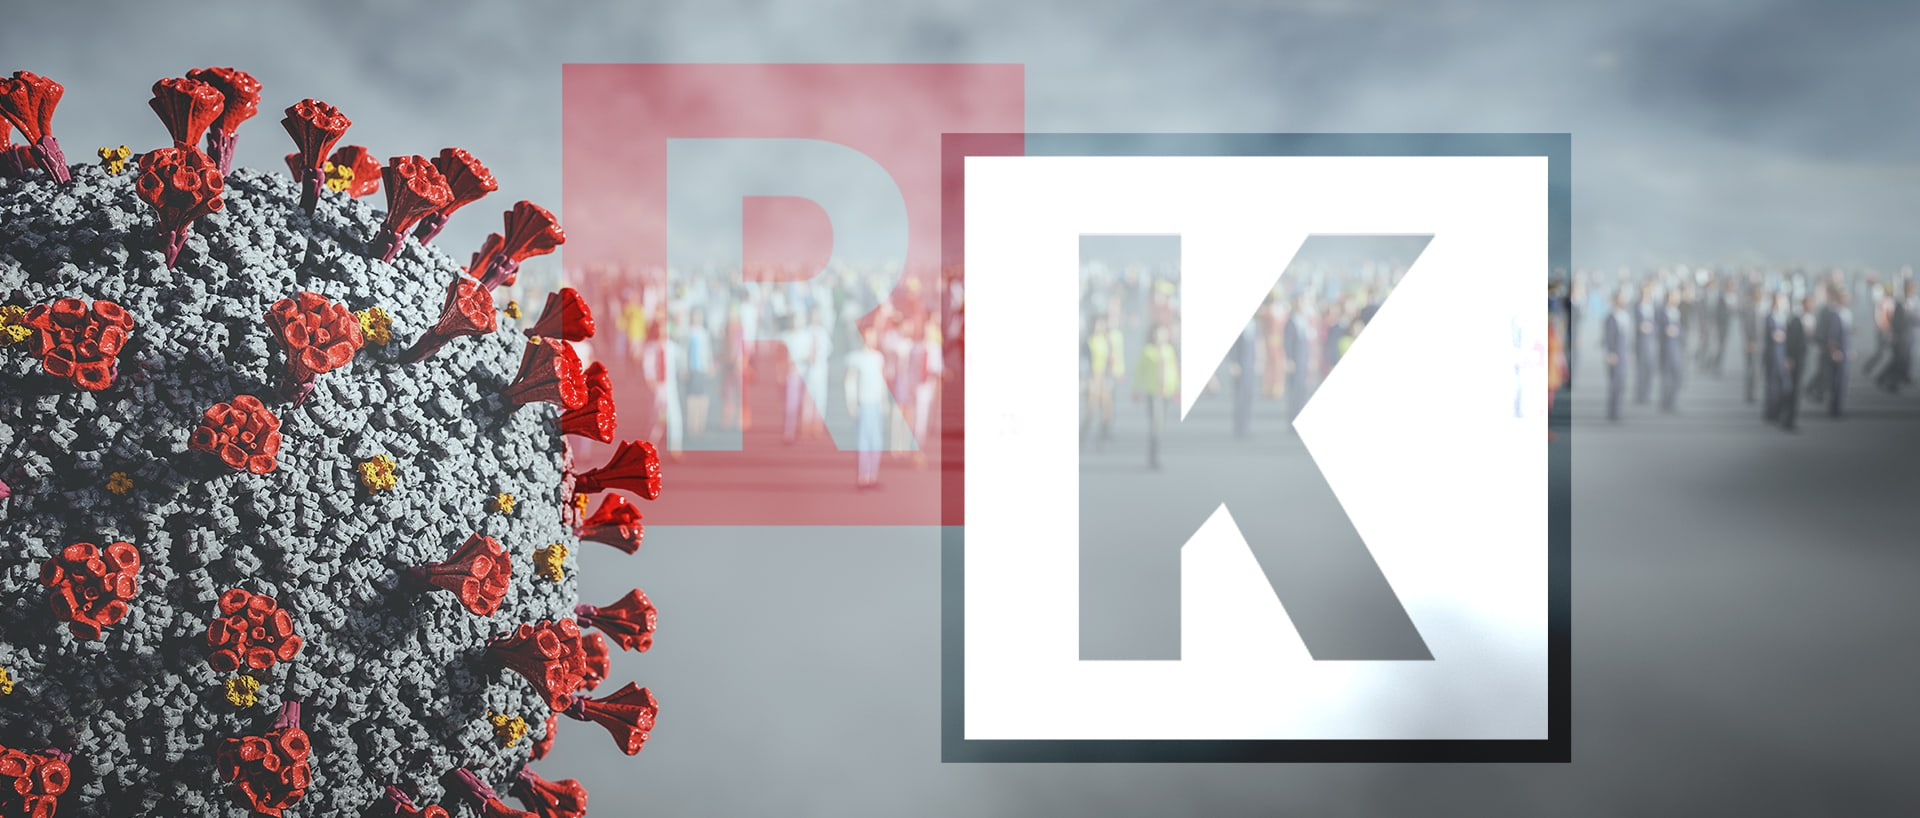 SYN-RG-Ai Article R and K Variable